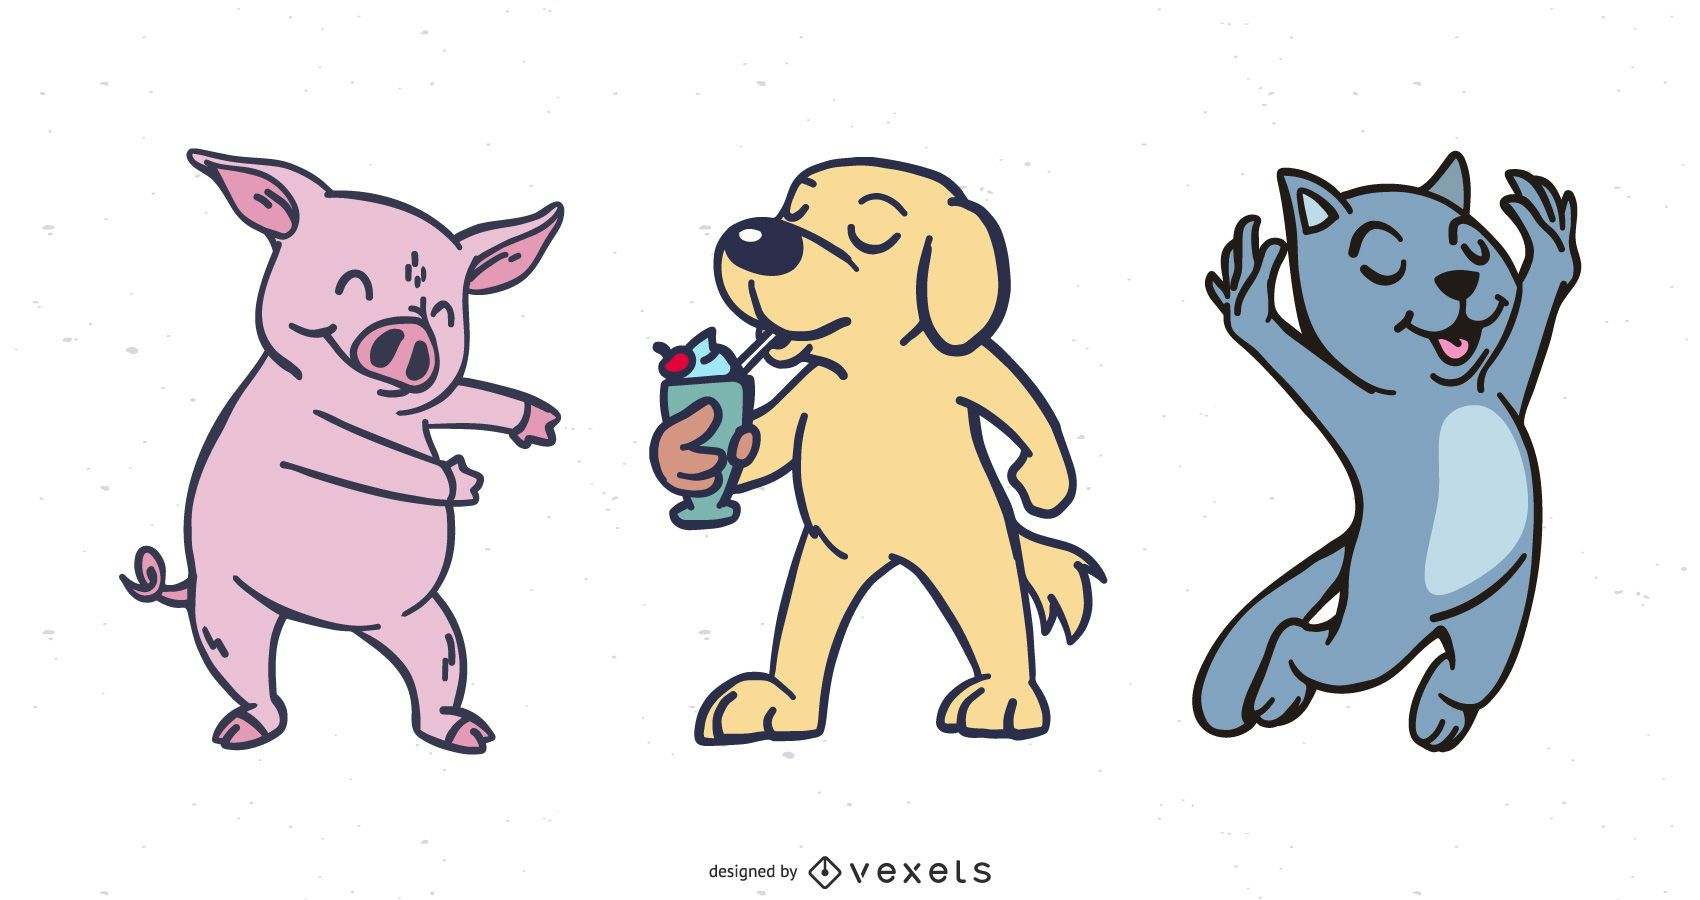 Paquete de personajes de dibujos animados funky